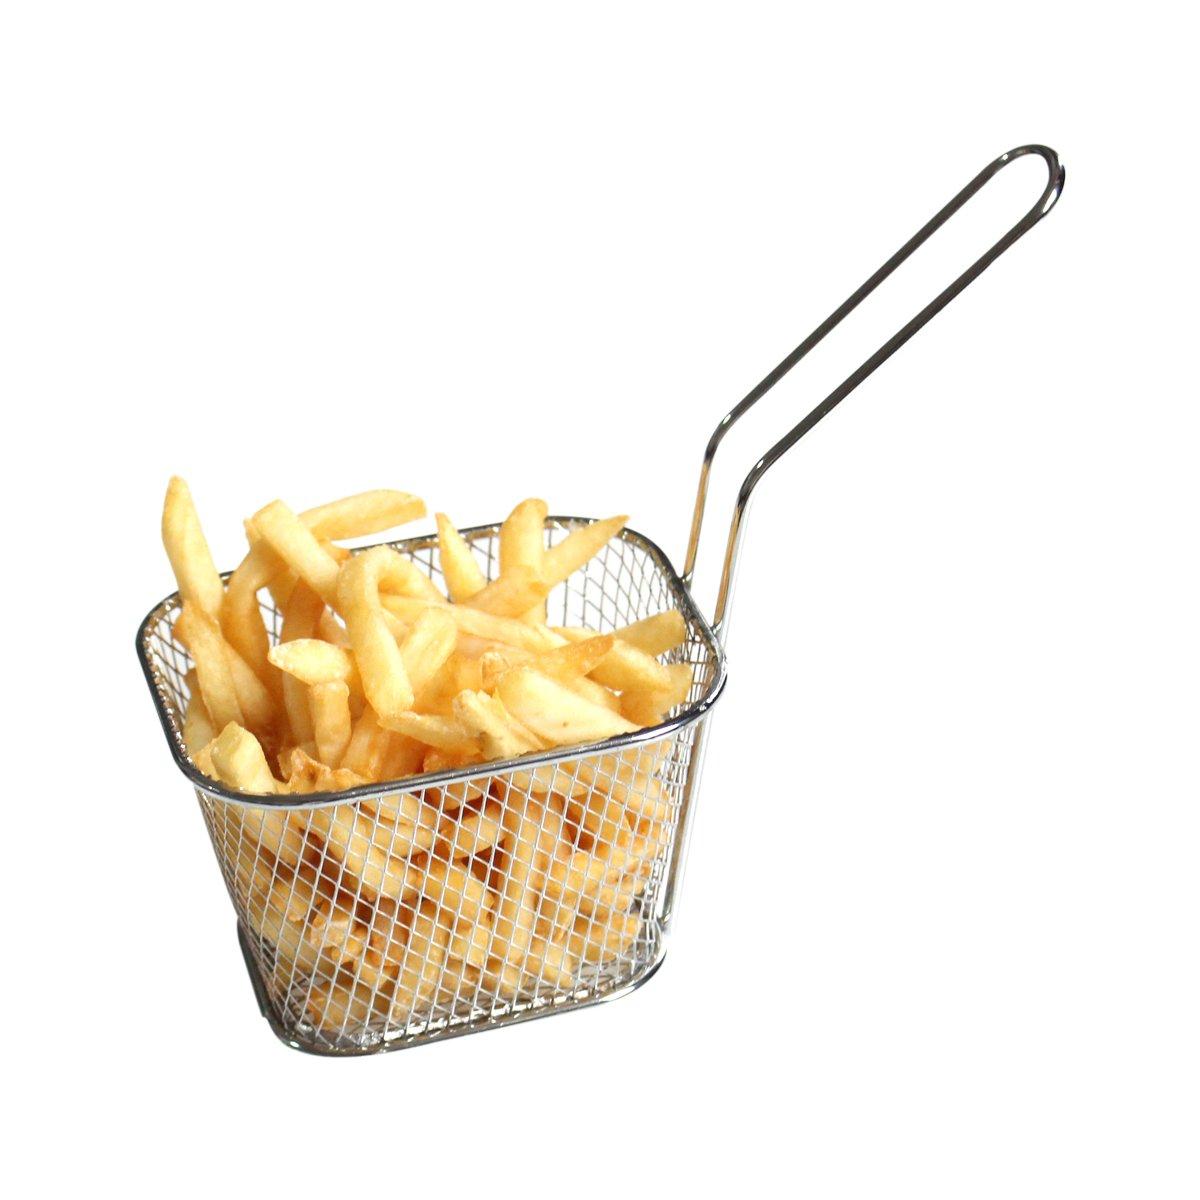 Huajian Mini Fry Basket Mini Fry Basket Square Fryer Basket Present Fried Chip Food, Table Serving (1)